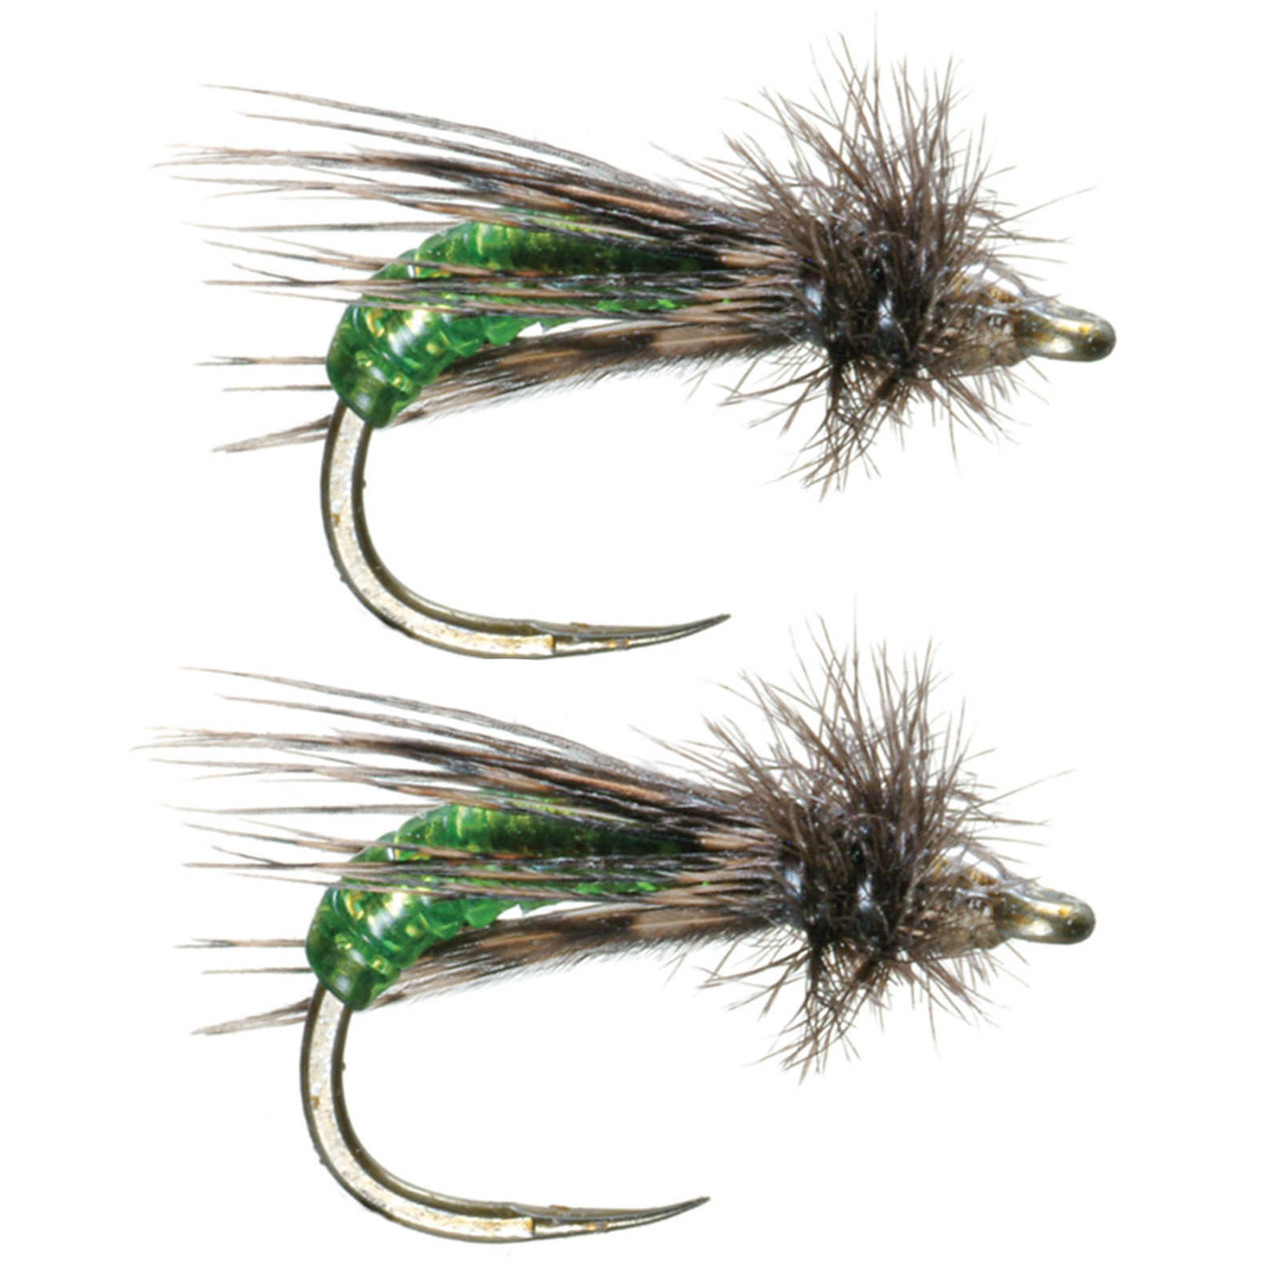 Umpqua Barr/'s Graphic Caddis Olive 2 Pack Emerger Fly Fishing Flies